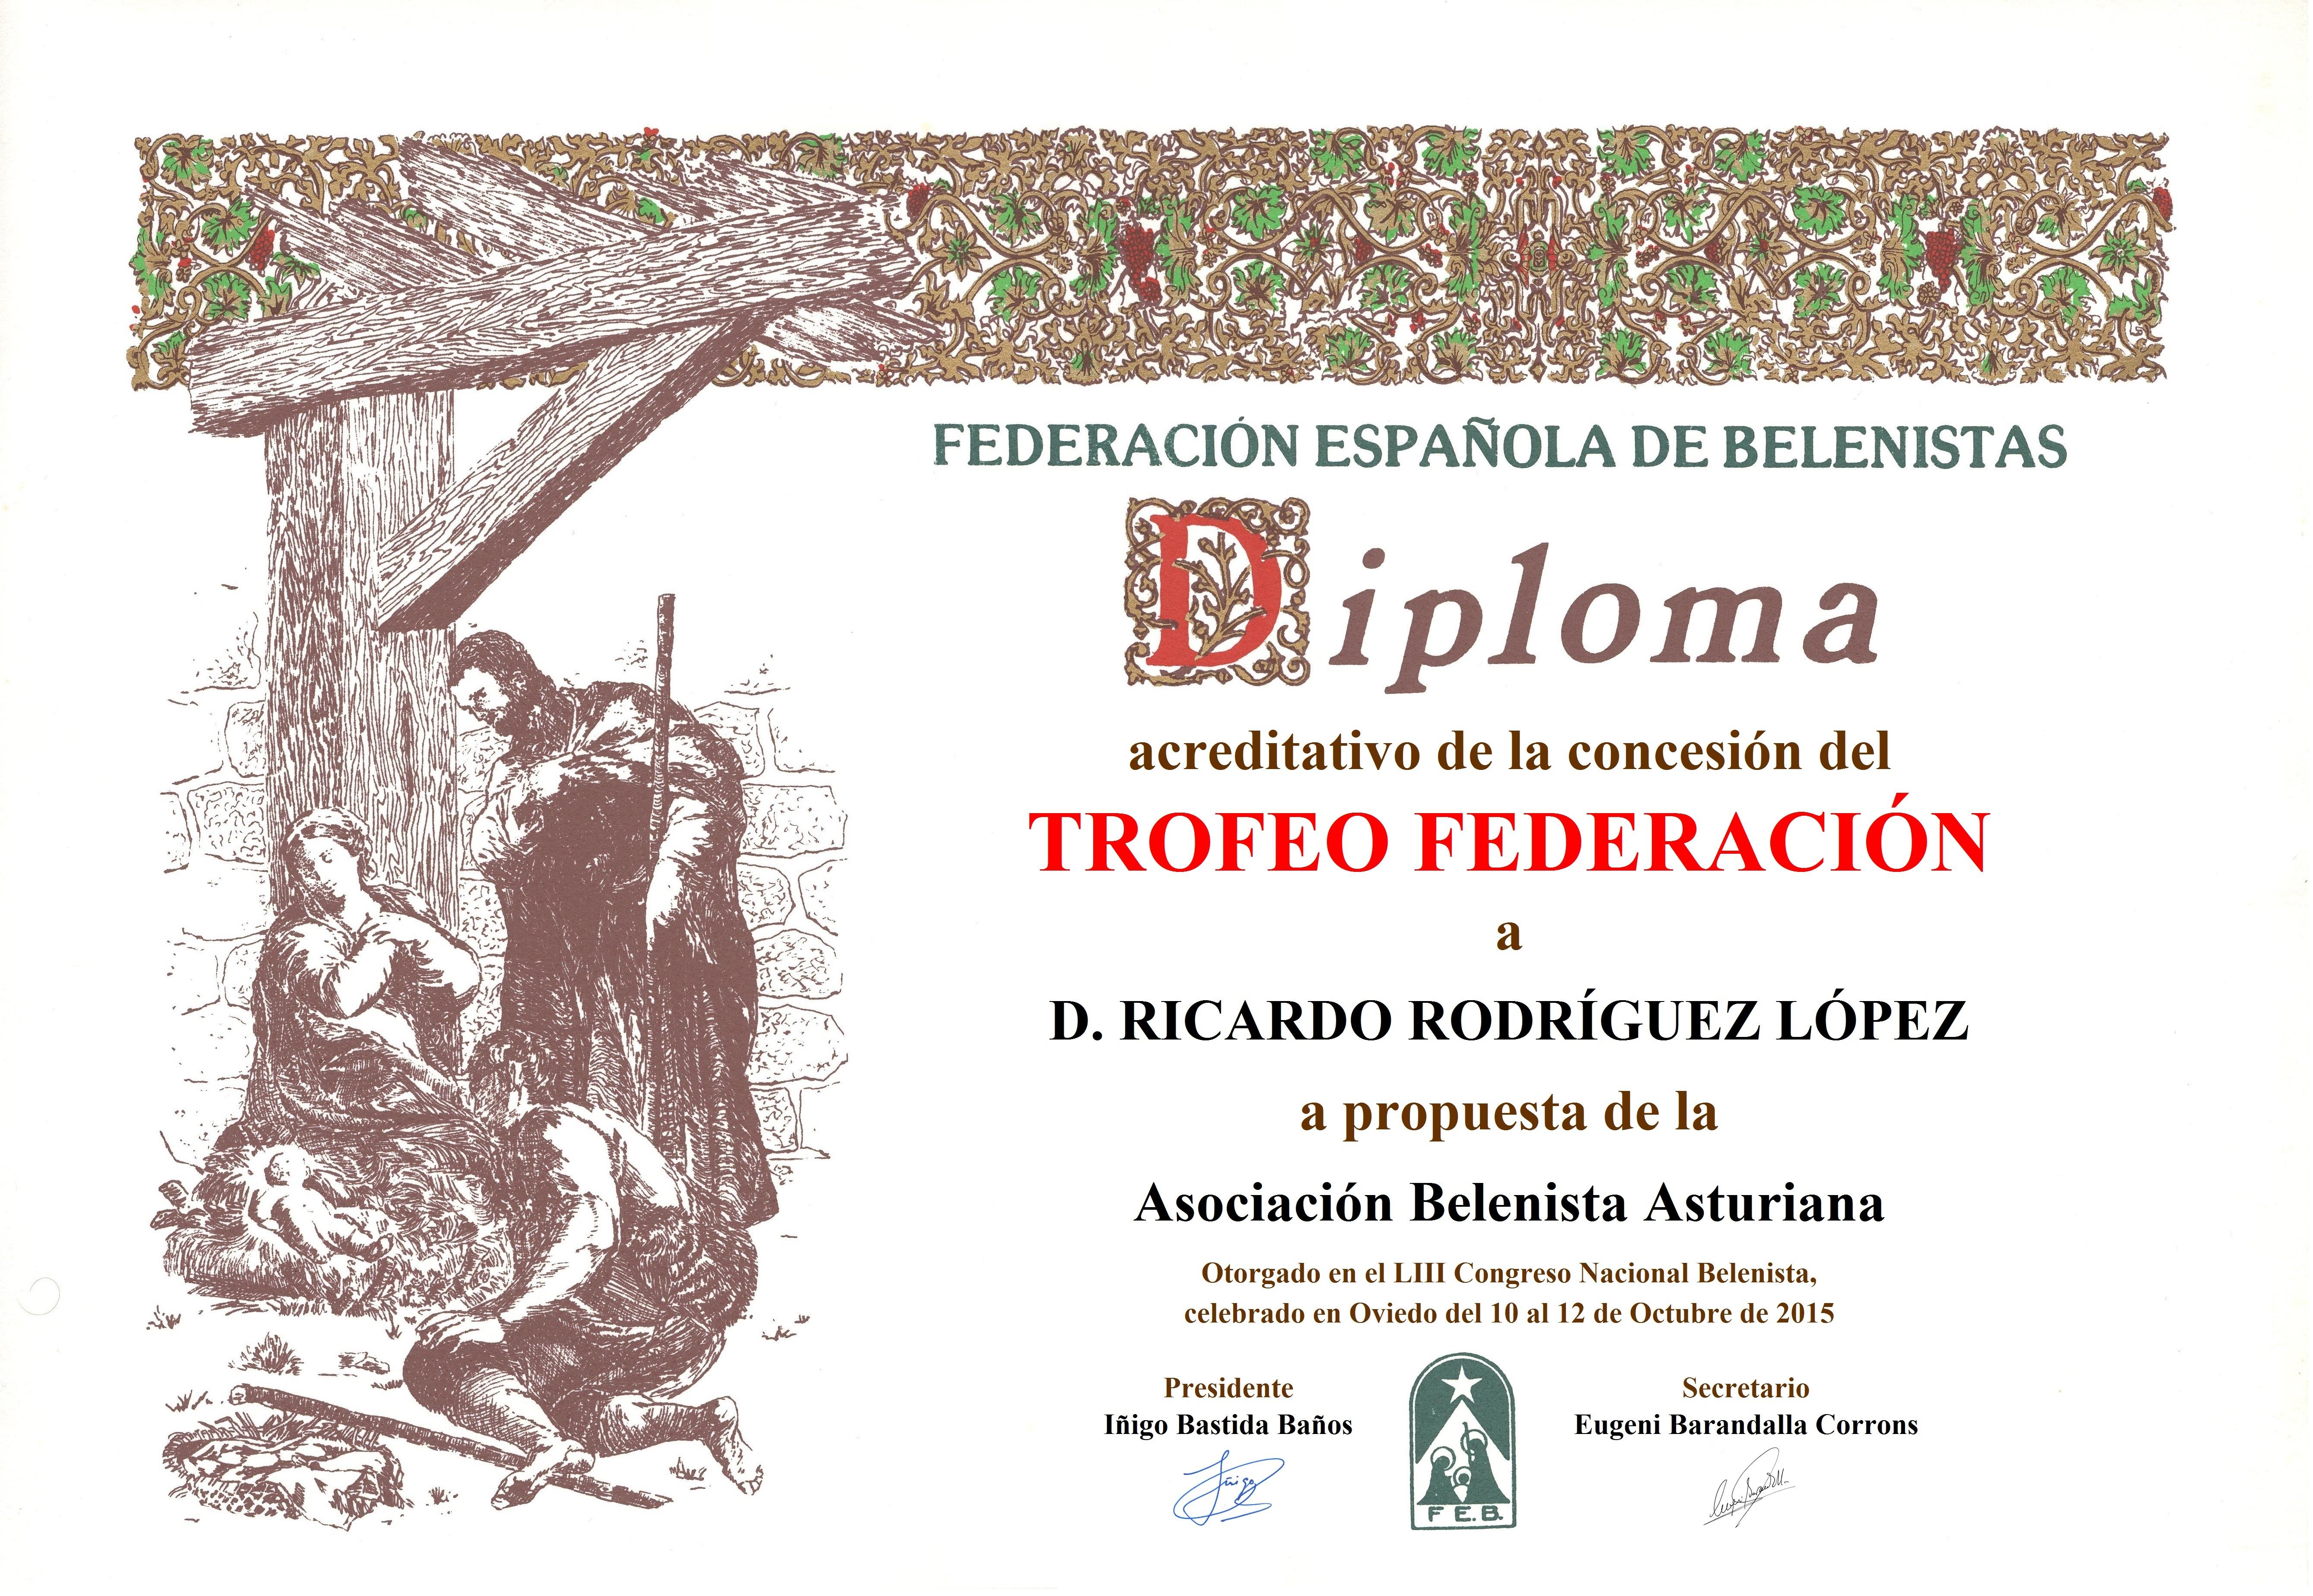 Diploma Trofeo FEB 2015 Ricardo Rodríguez López